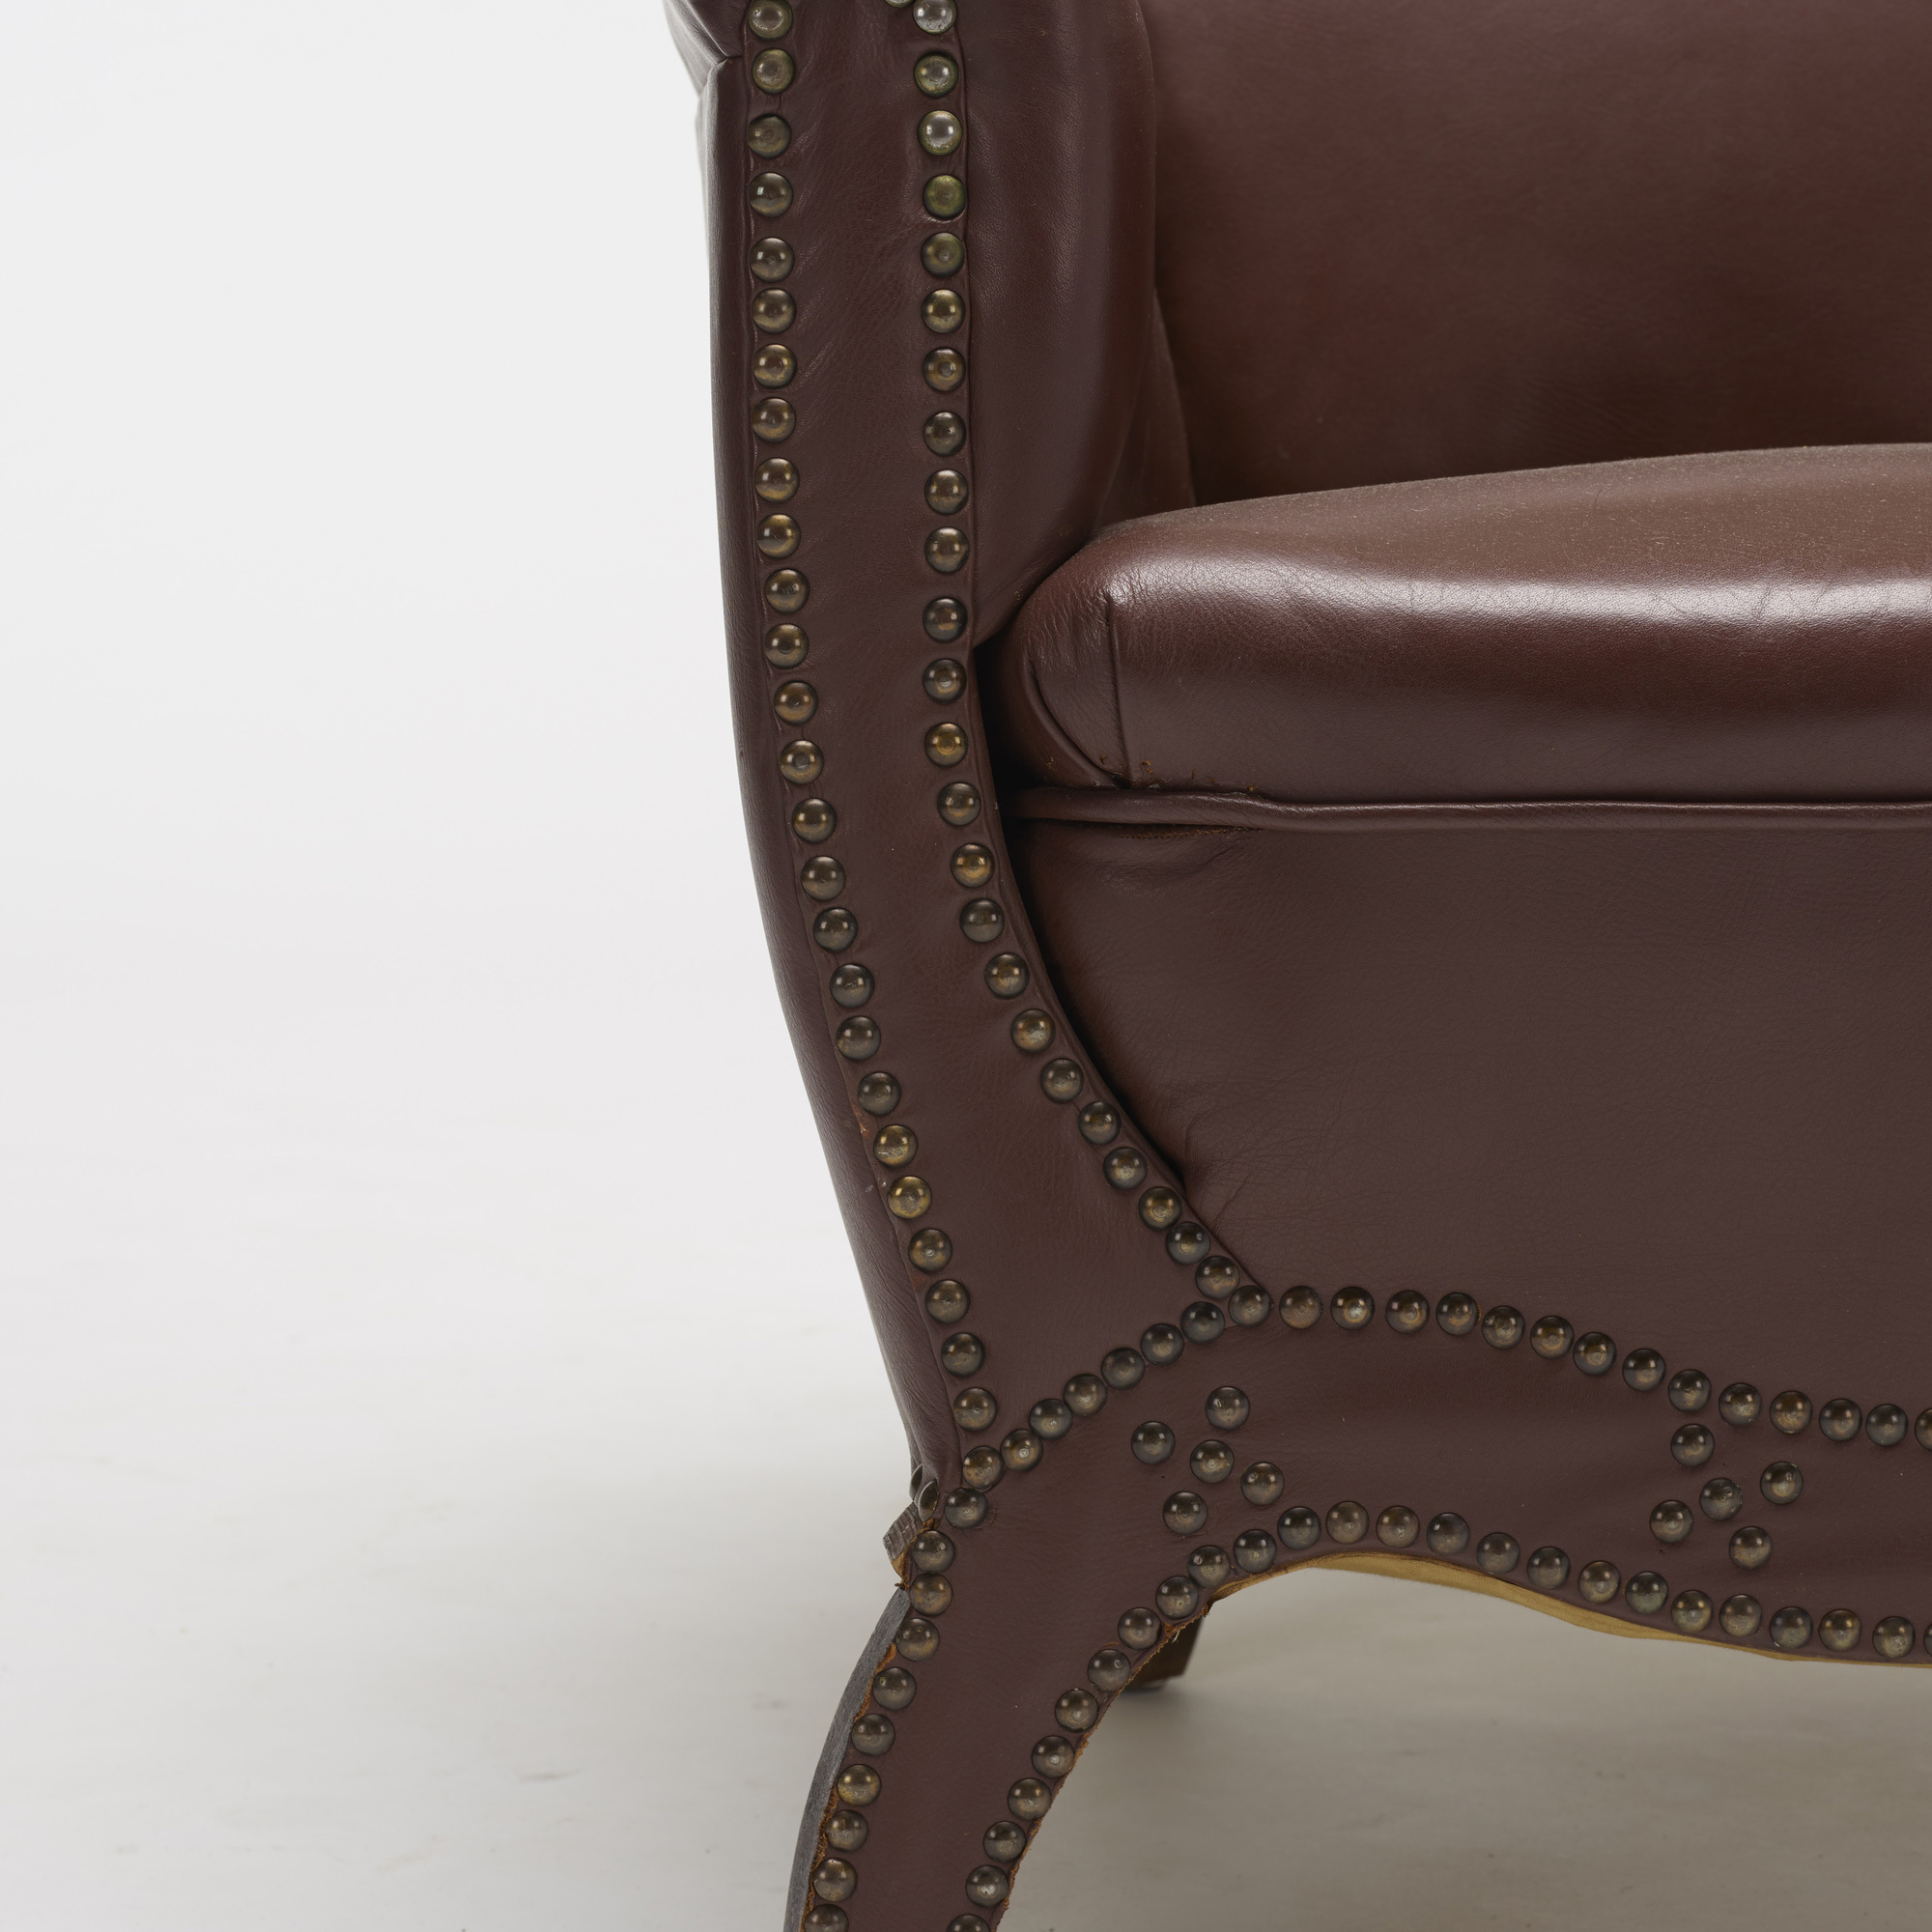 720: Otto Schulz / armchair (3 of 3)